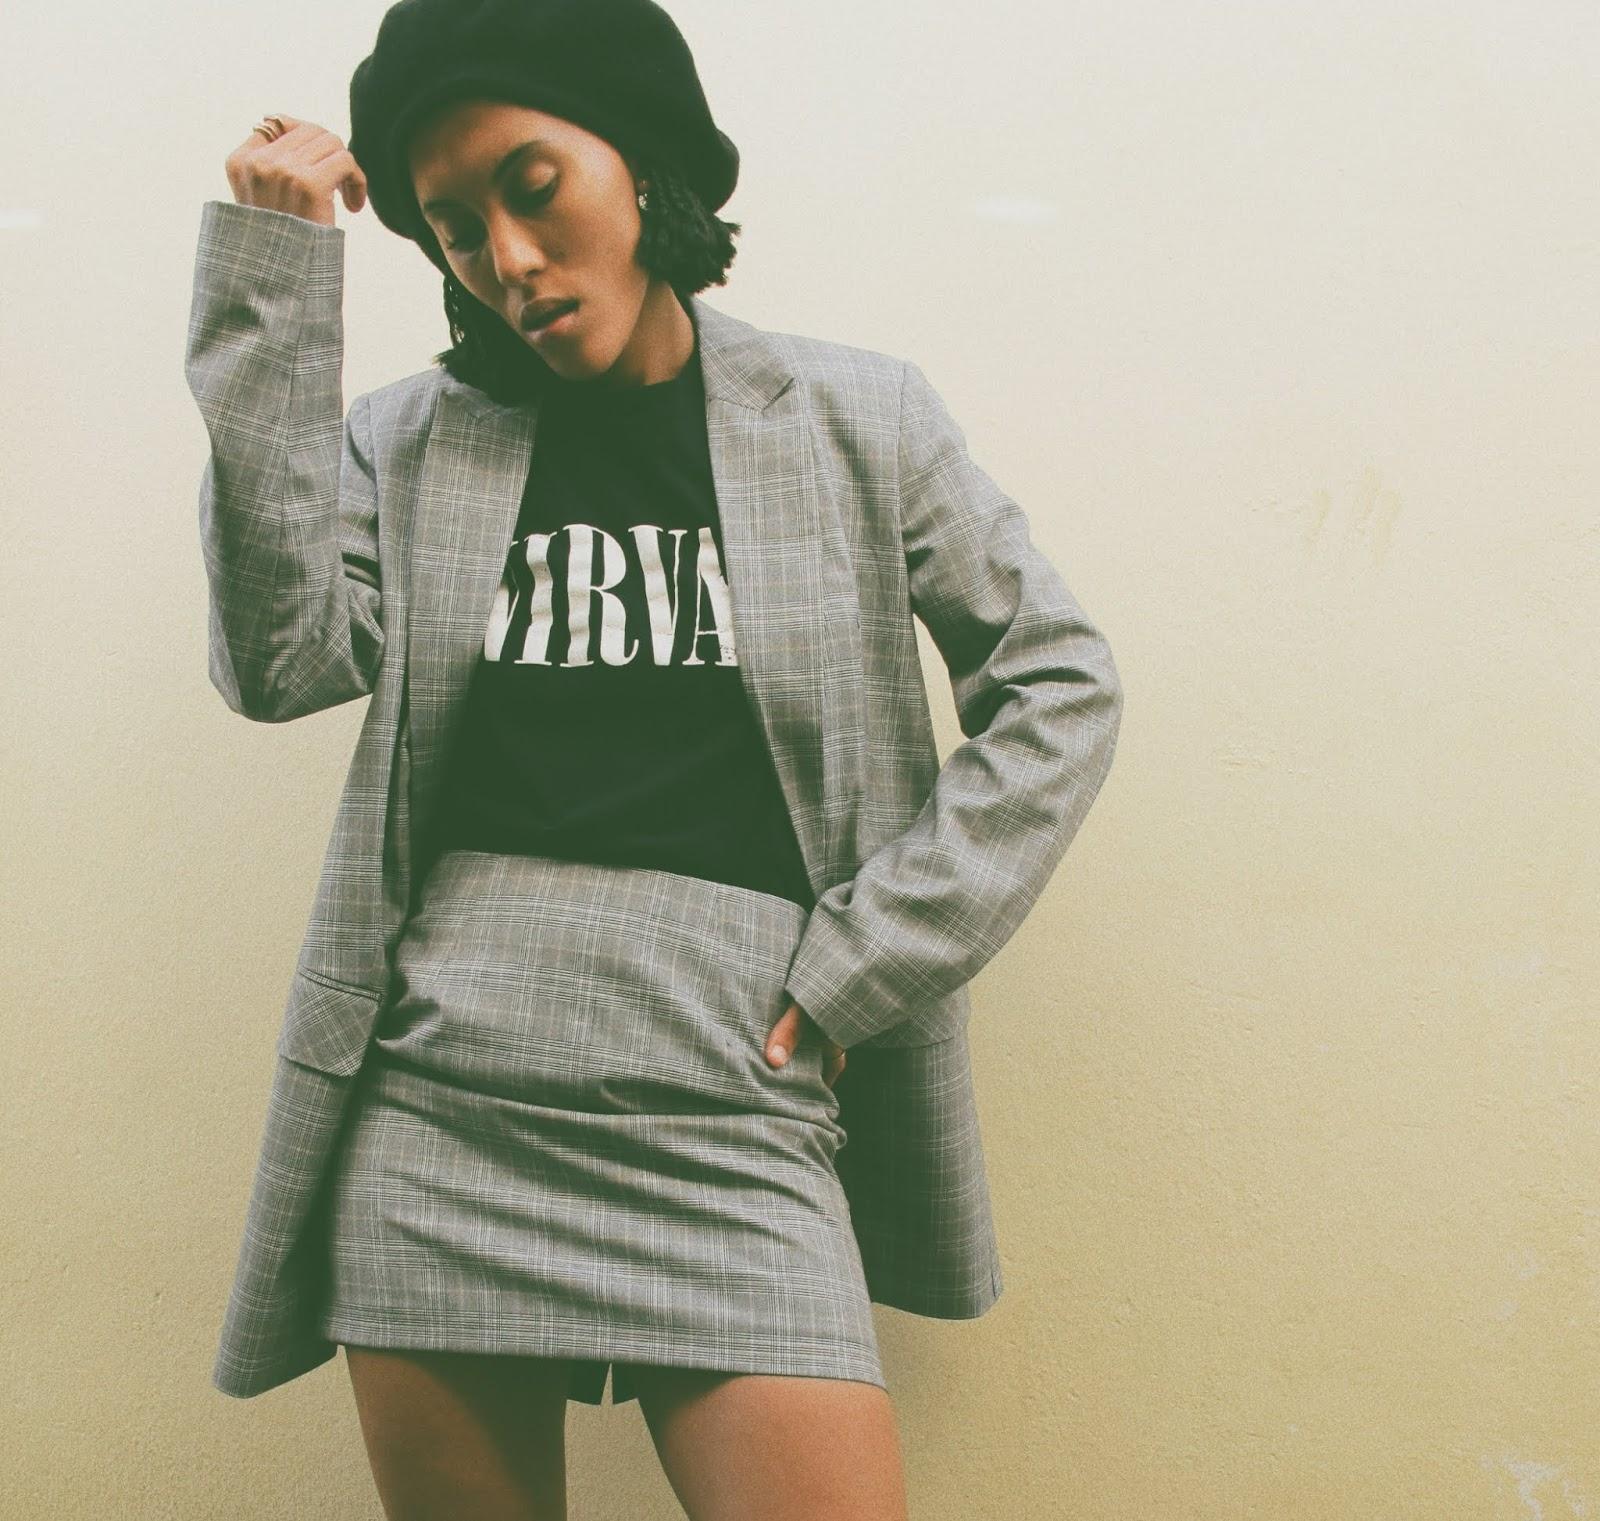 Liezel-Esquire-how-to-wear-a-skirt-suit